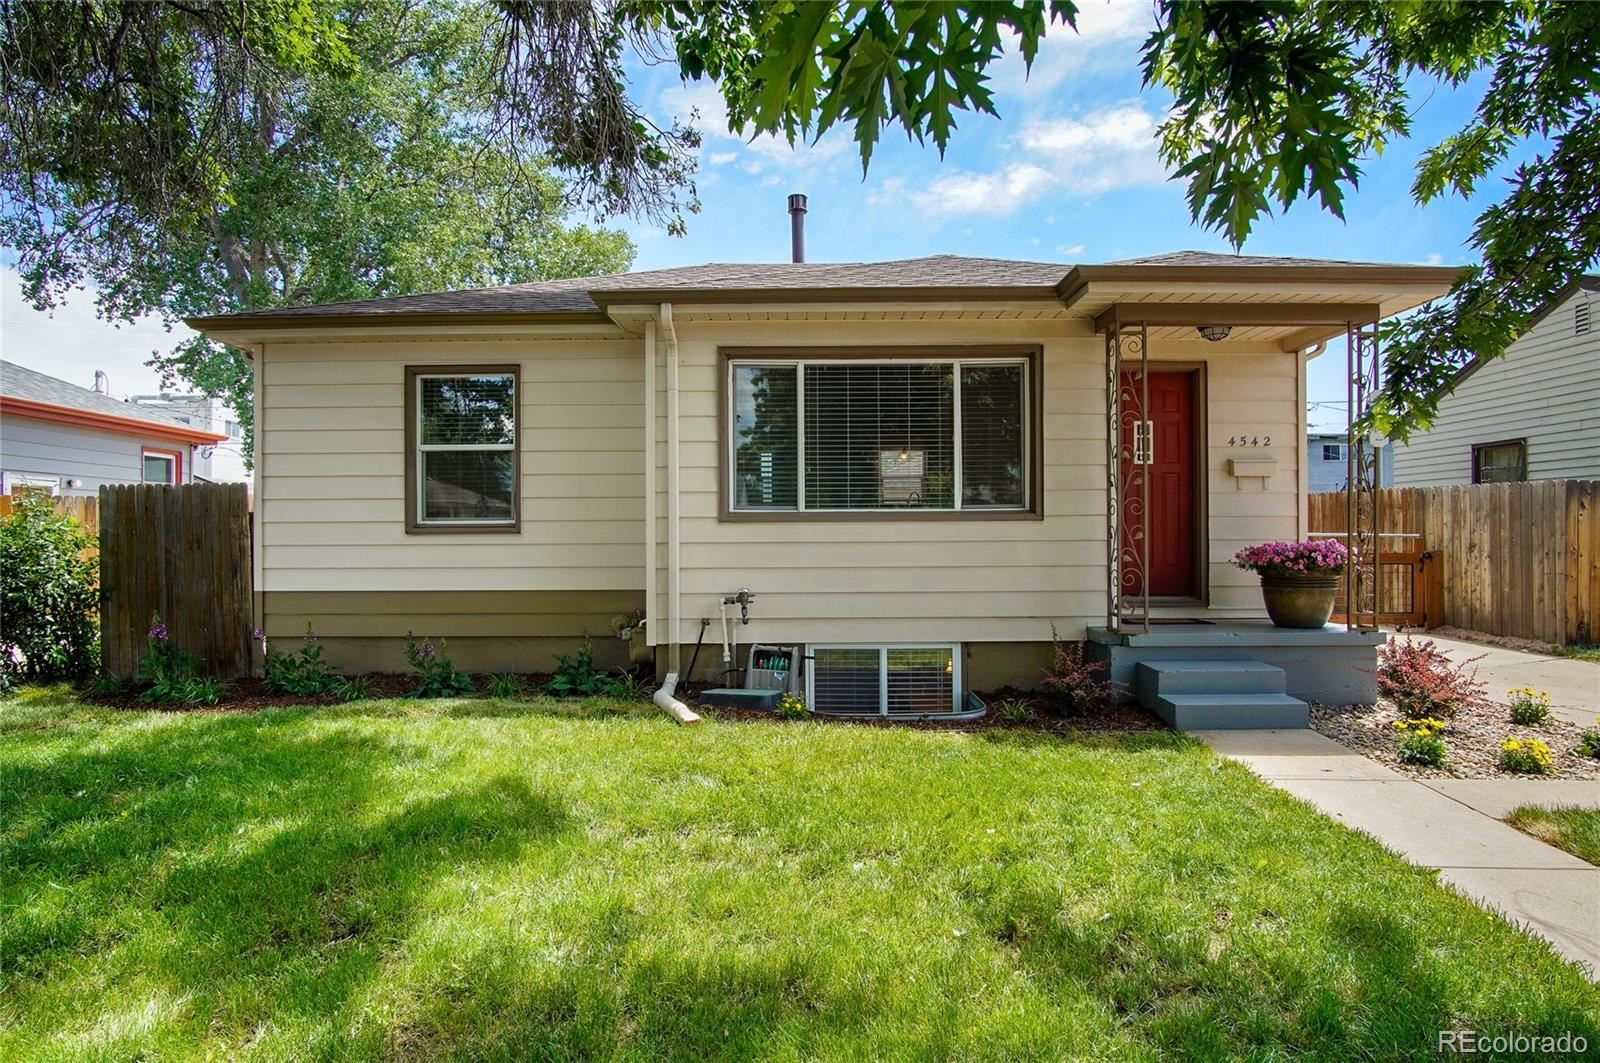 4542 S Acoma Street, Englewood, CO 80110 - #: 3373914